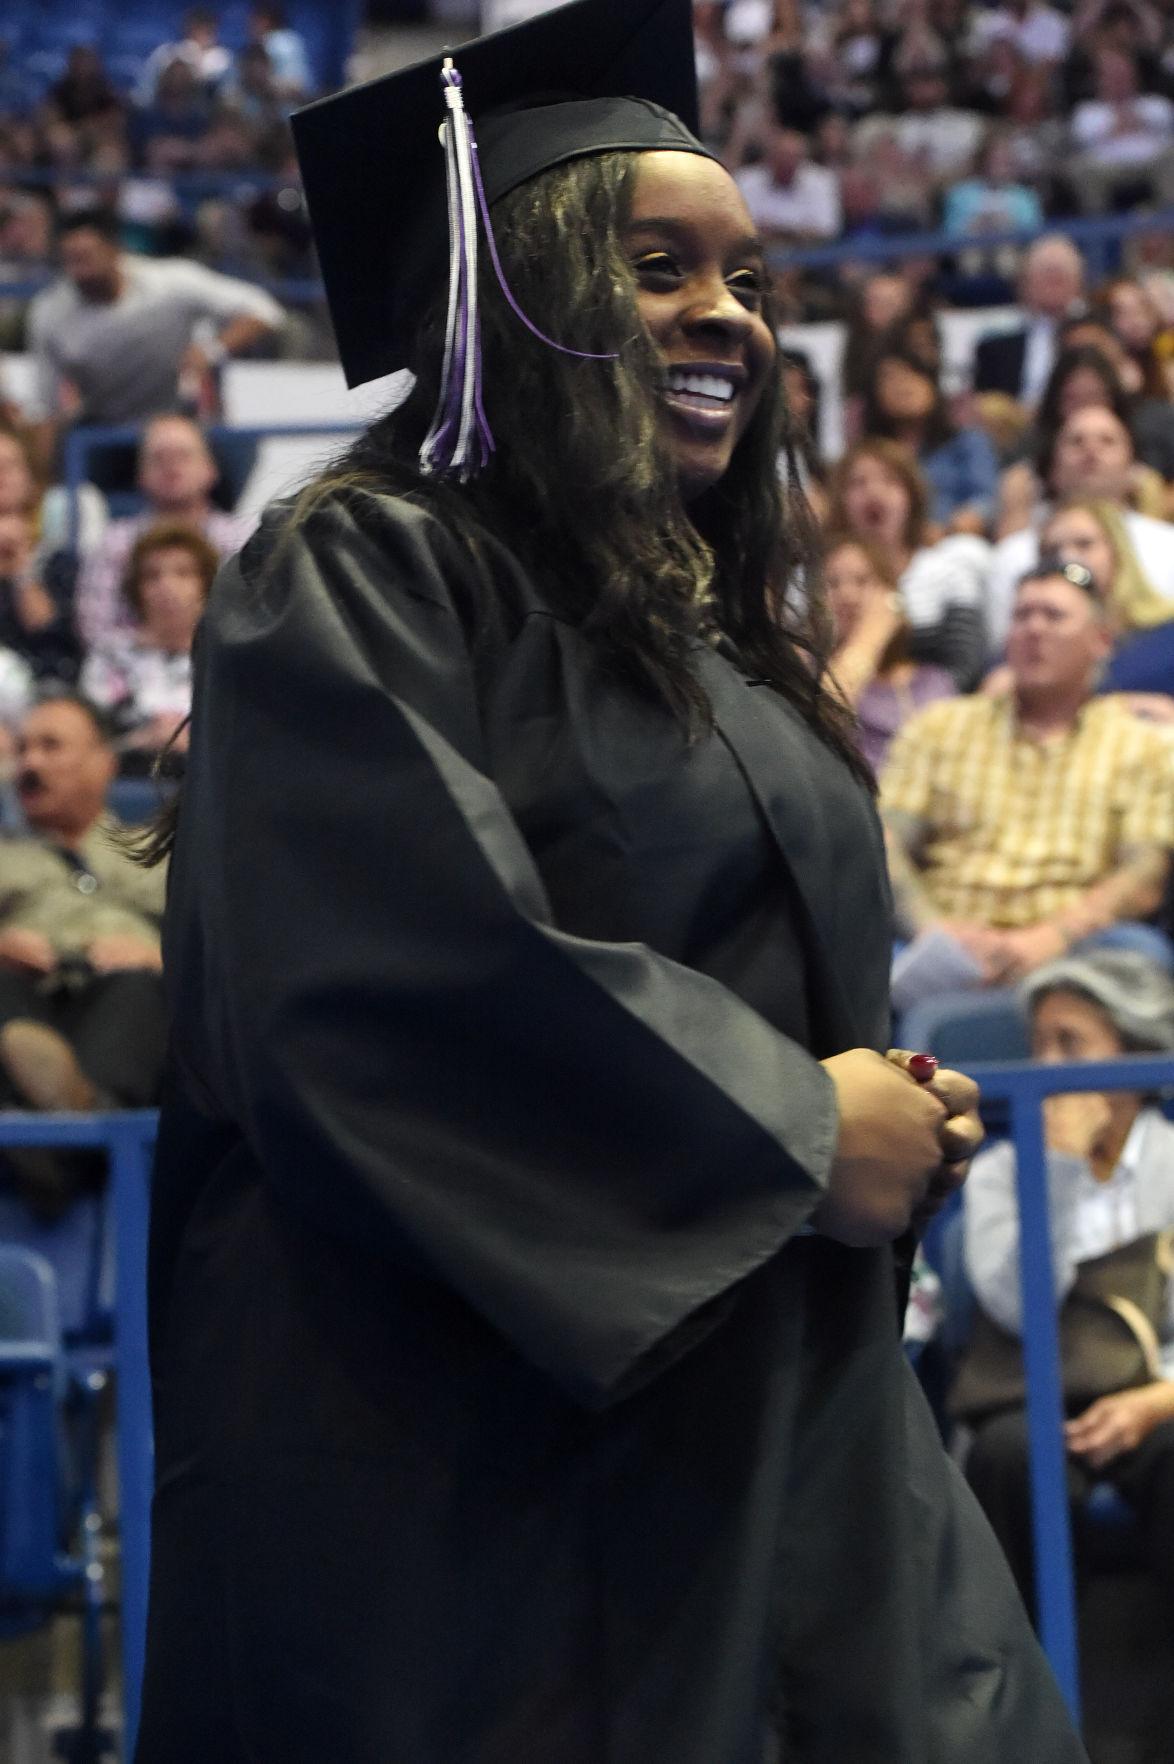 PHOTOS: Discovery Canyon High School Graduation